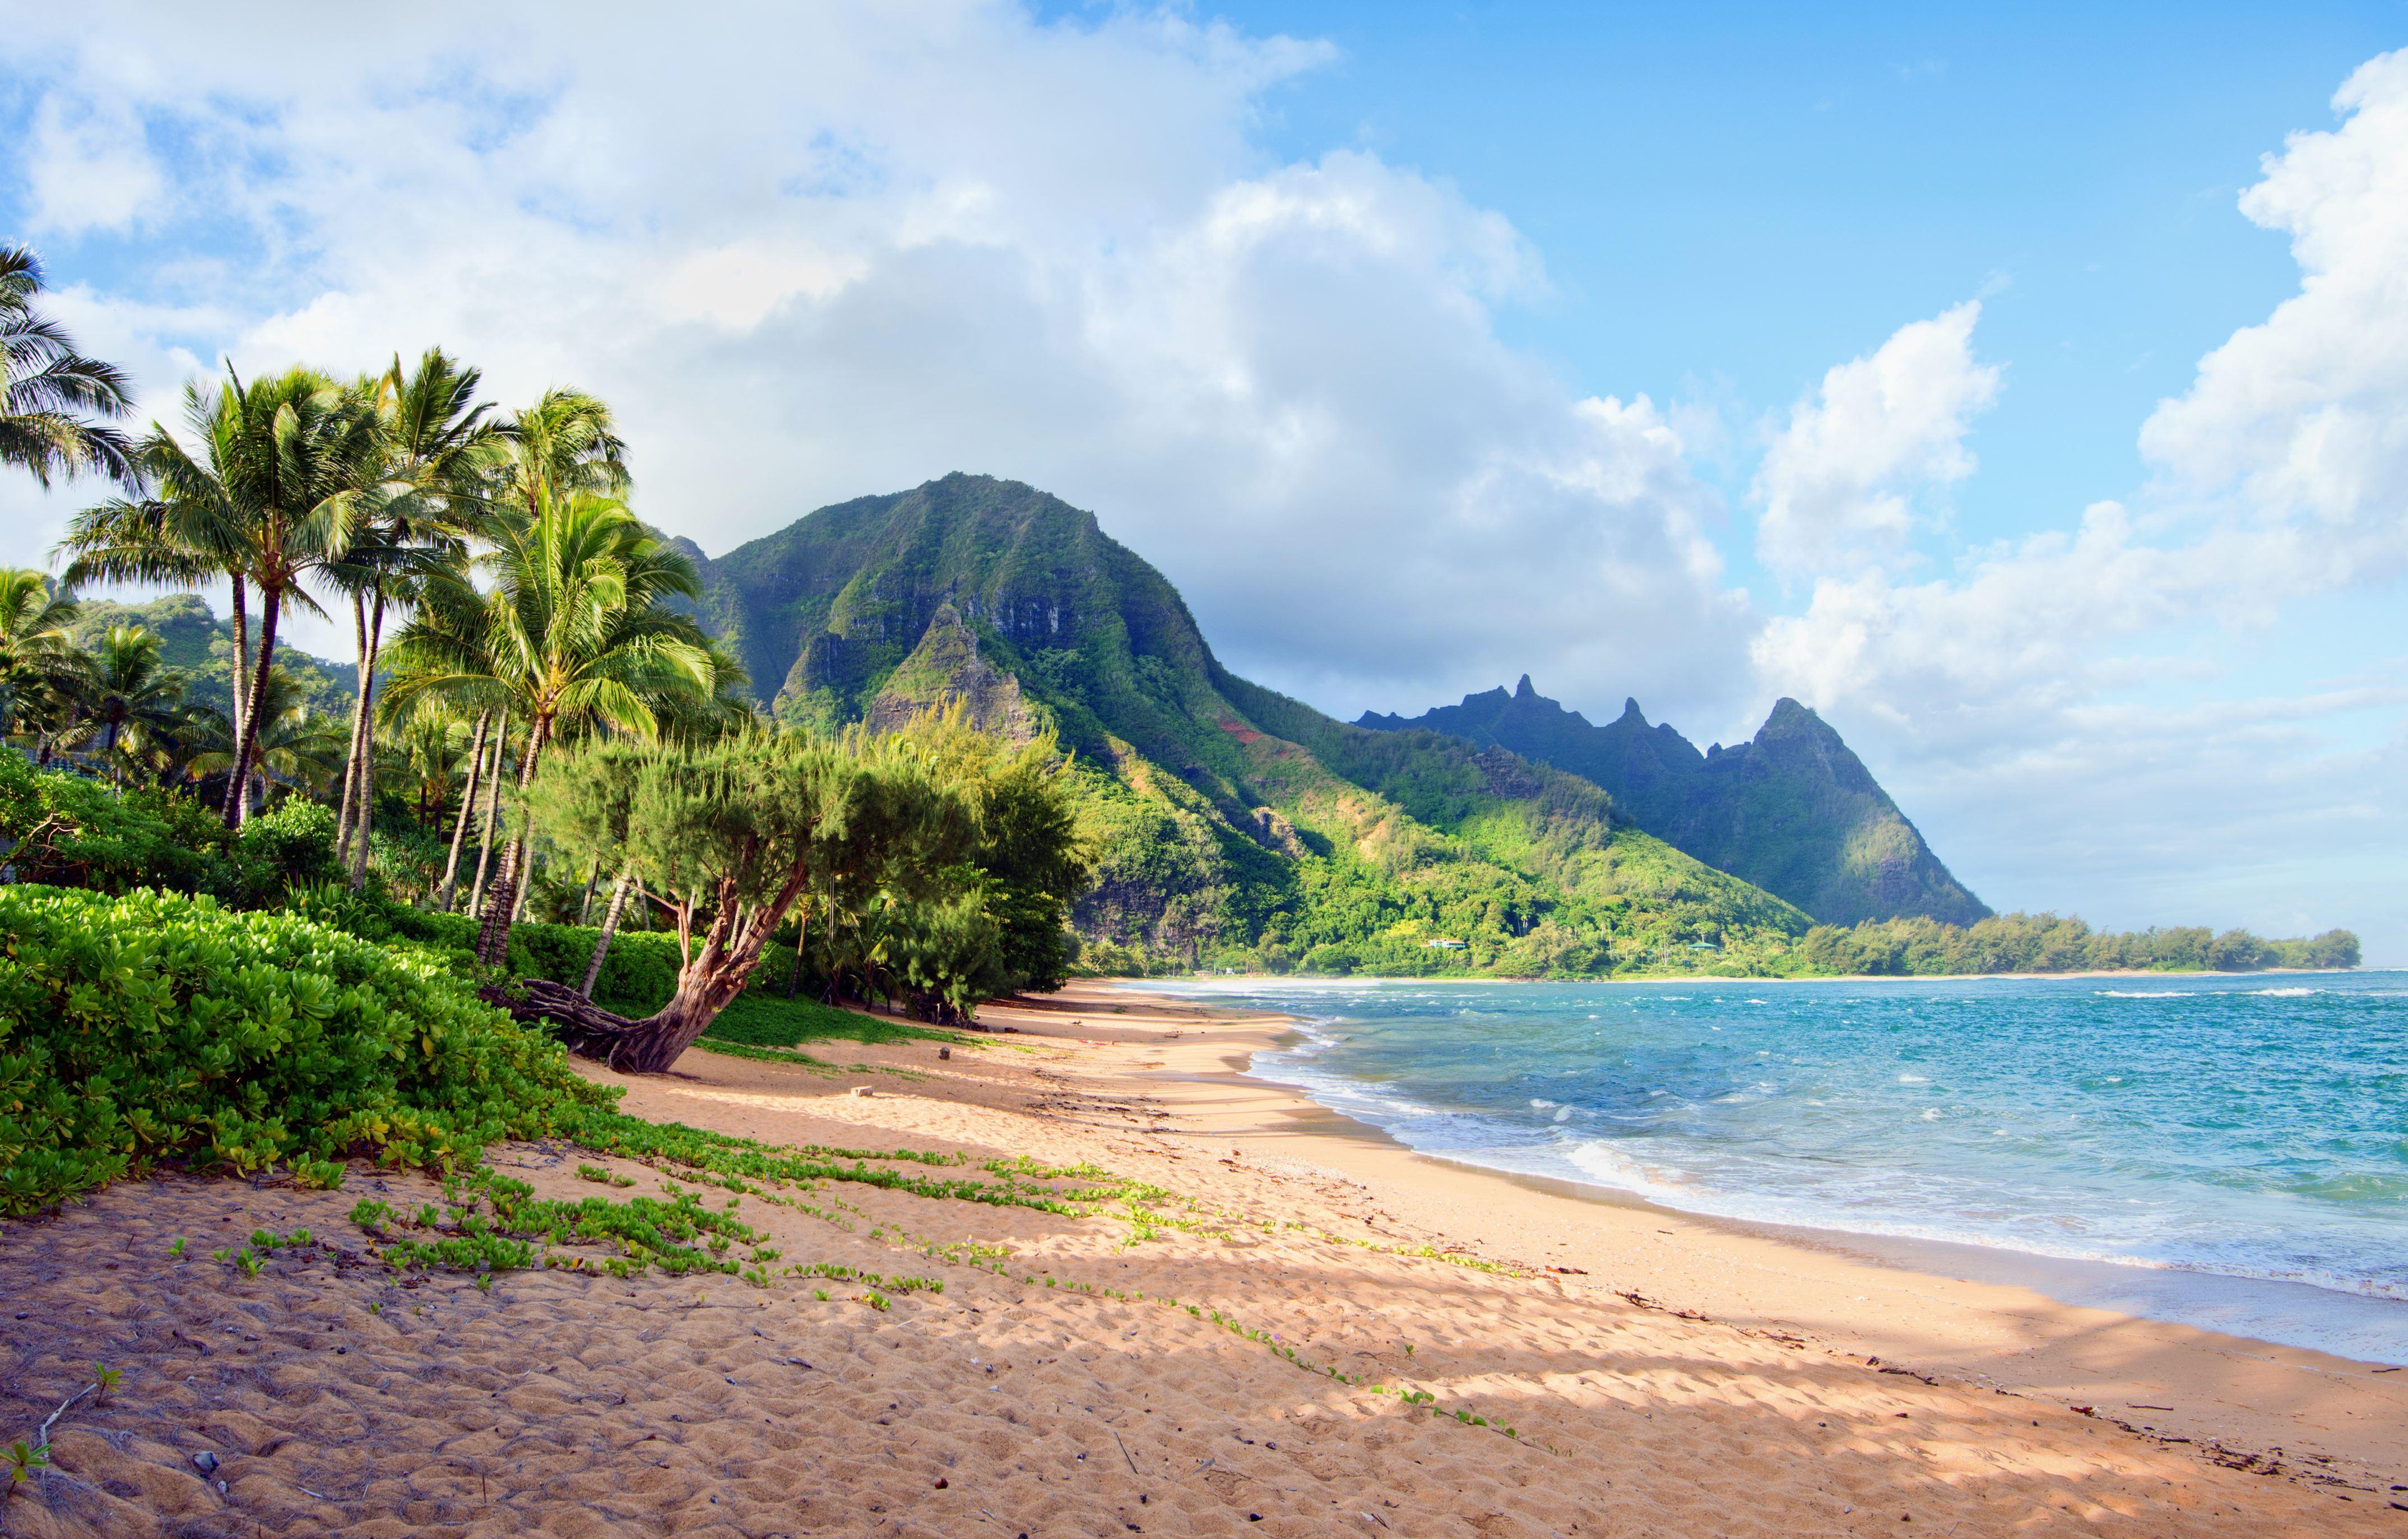 Slide 12 of 23: Tropical palm tree beach - Tunnels beach in Heana,